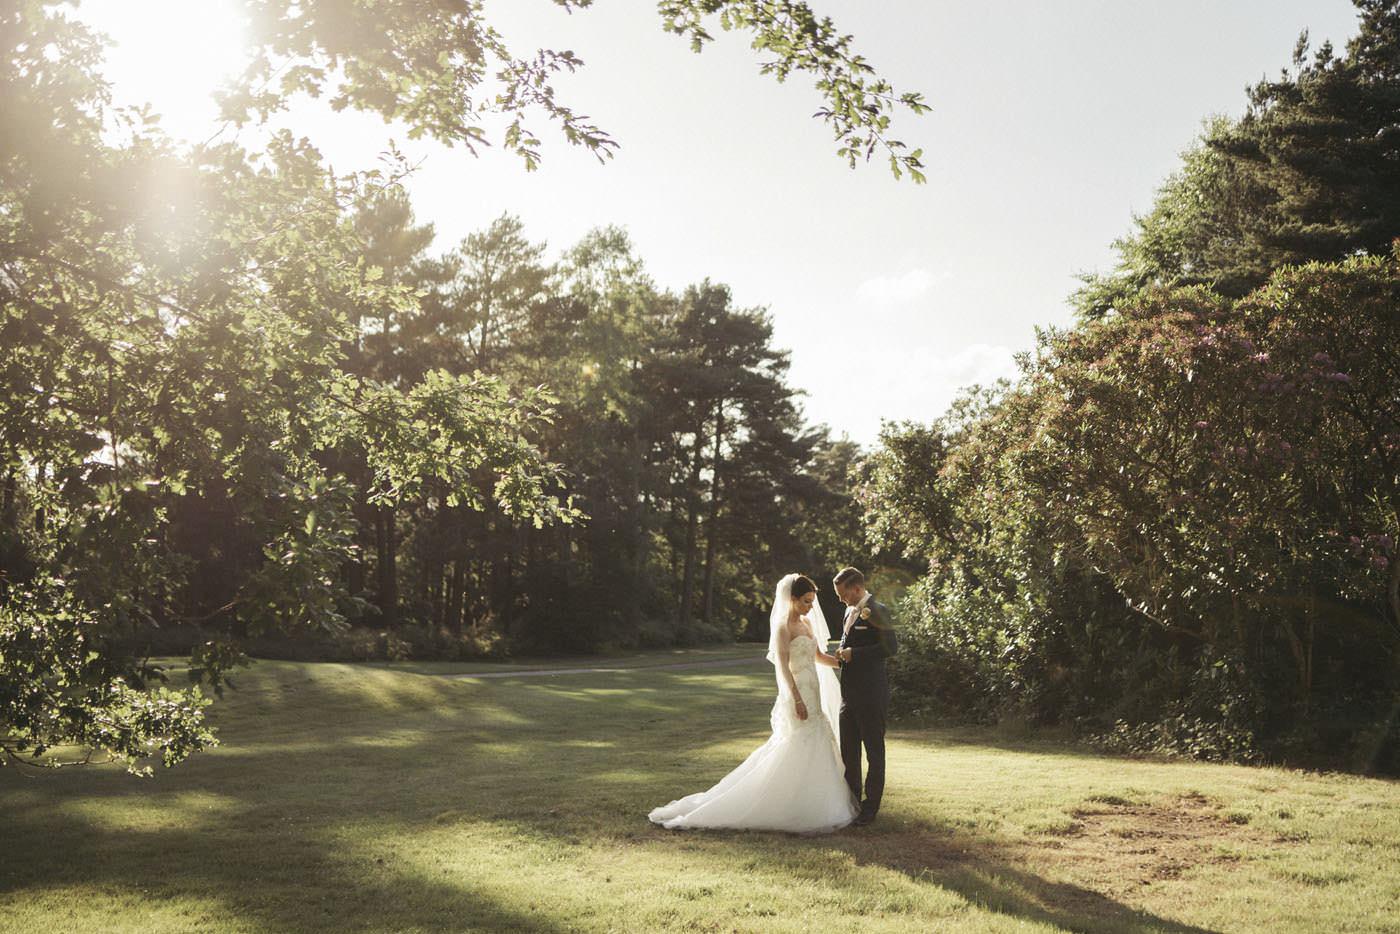 lukeemily foxhills wedding photographer 0127